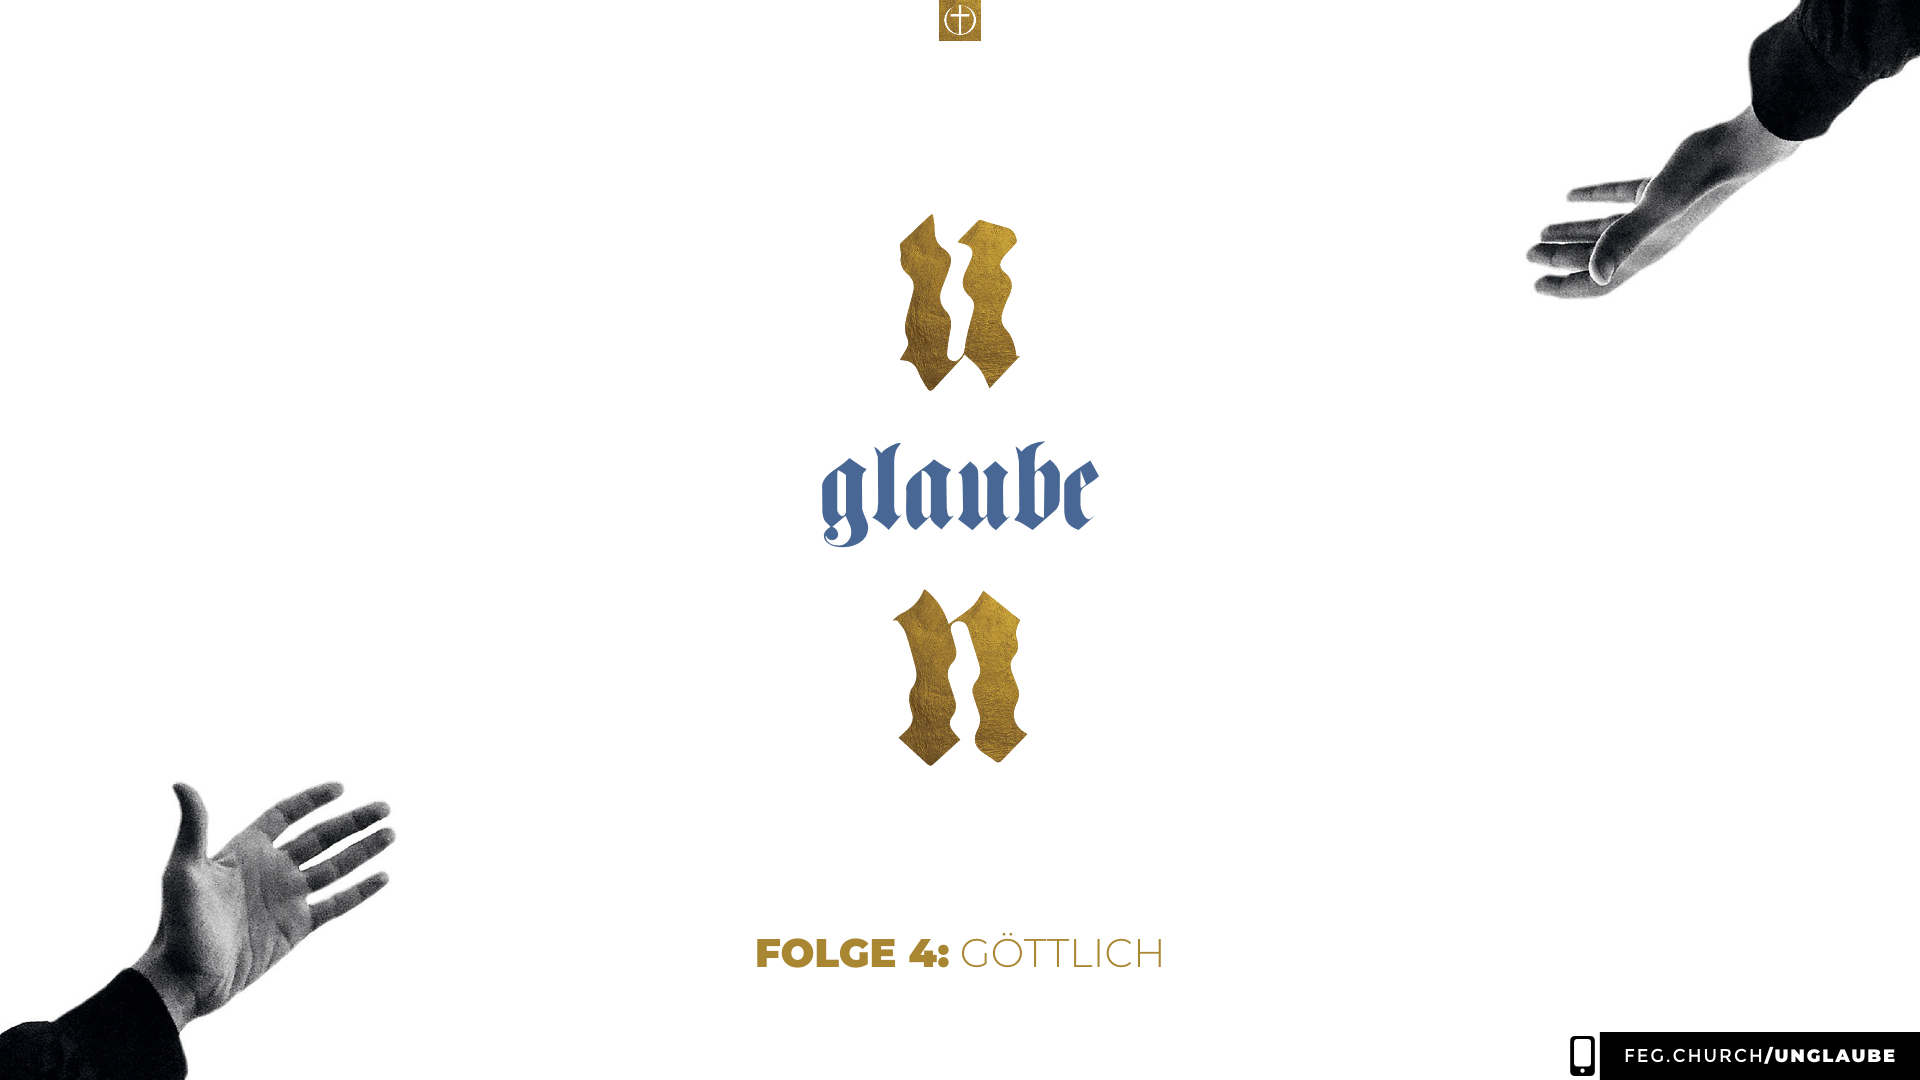 UN/GLAUBE – Folge 4: göttlich